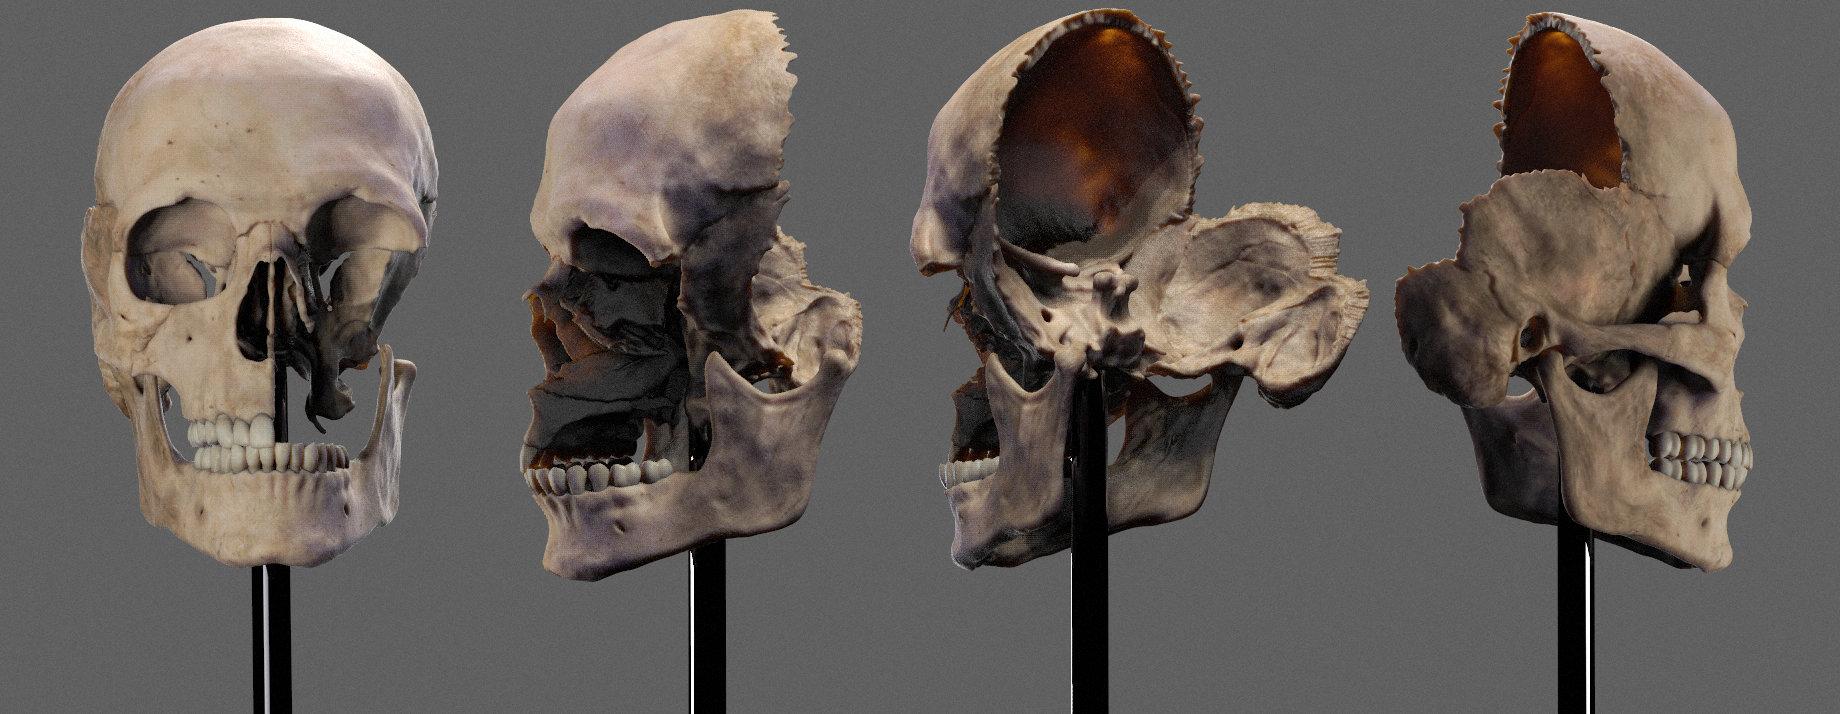 Human skull by Dmitrij Leppée